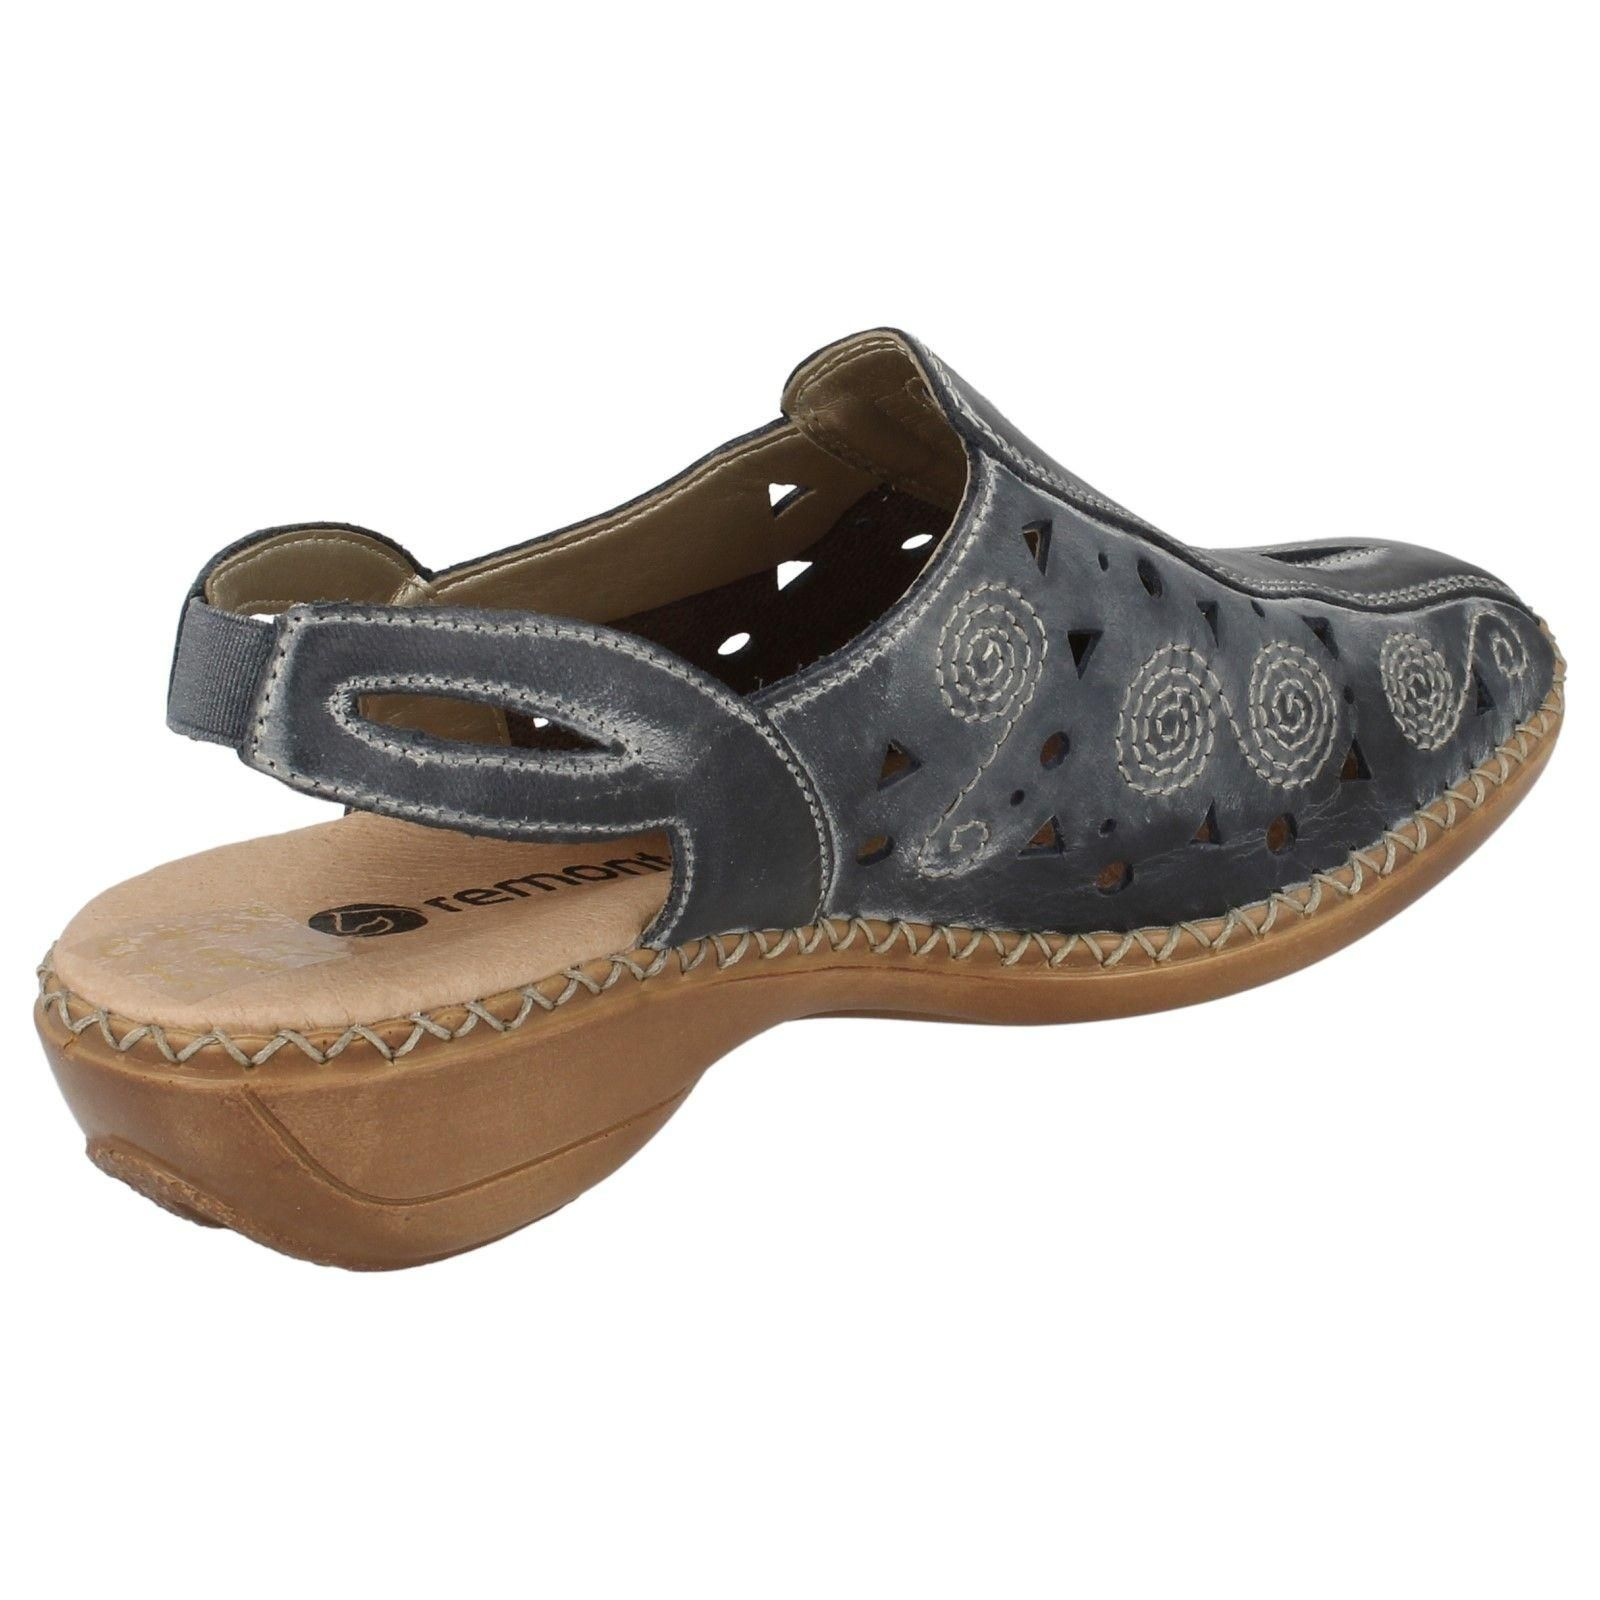 Remonte Ladies Shoes